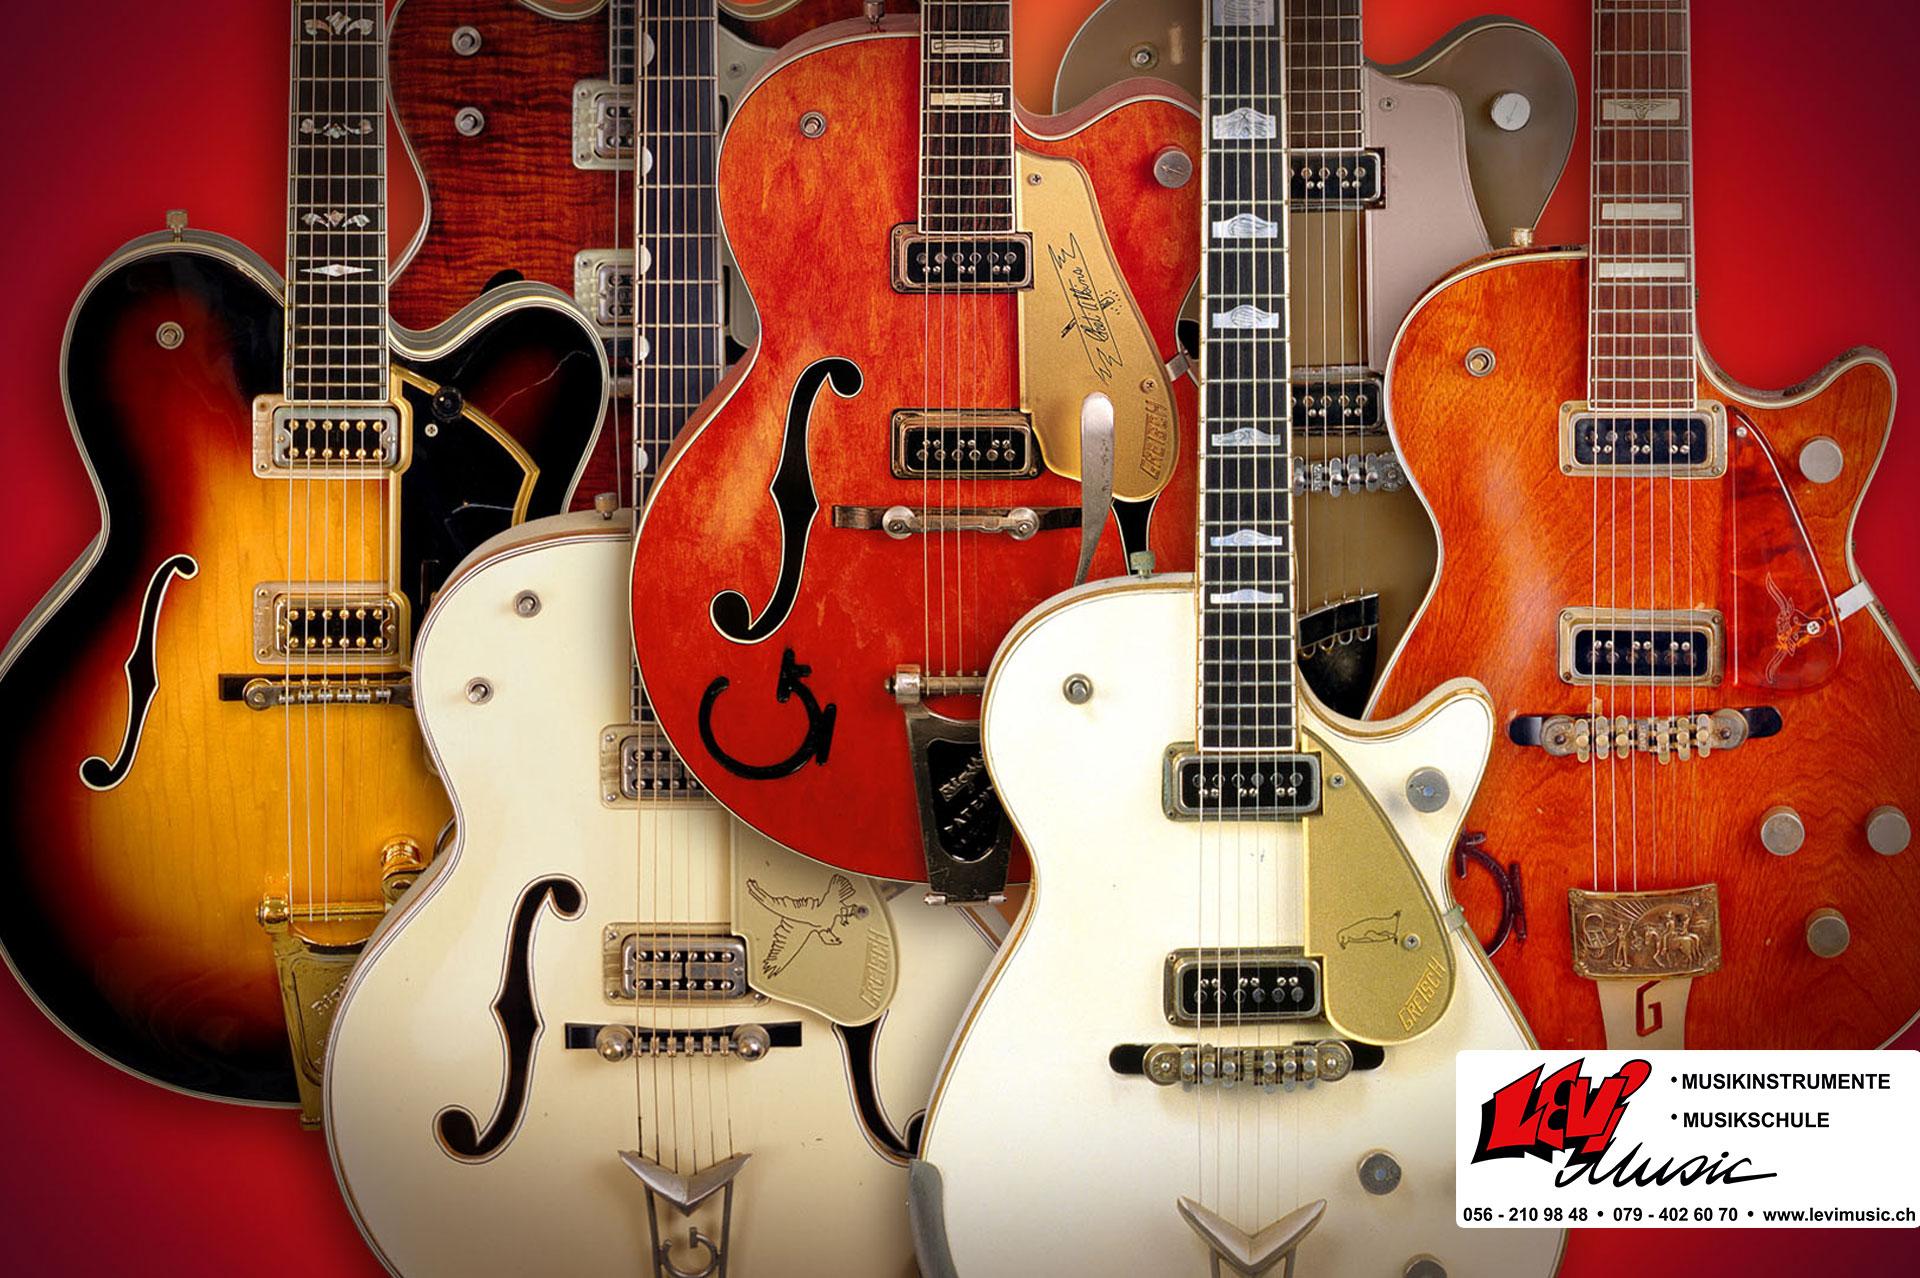 Levi Music - Musikinstrumente